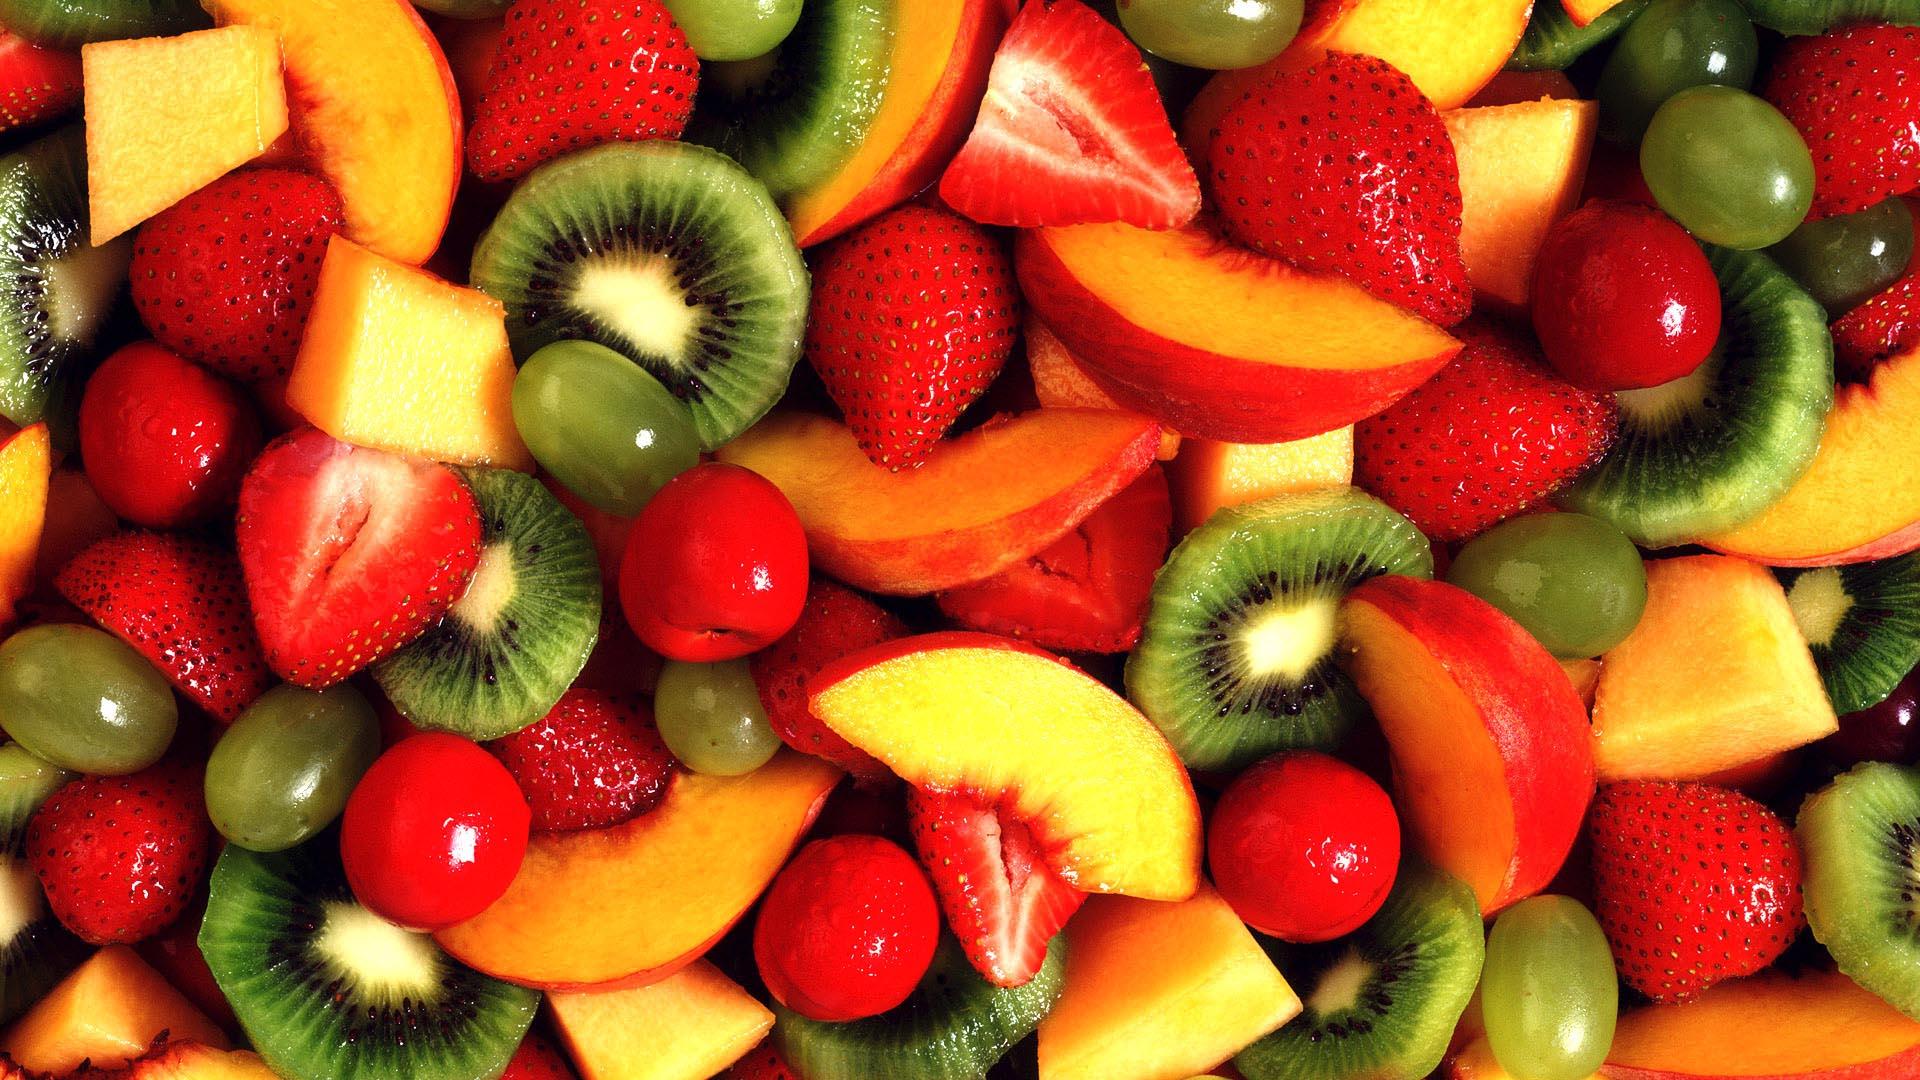 Fresh fruit wallpaper - Fresh Fruit Hd Wallpaper Fullhdwpp Full Hd Wallpapers 1920x1080